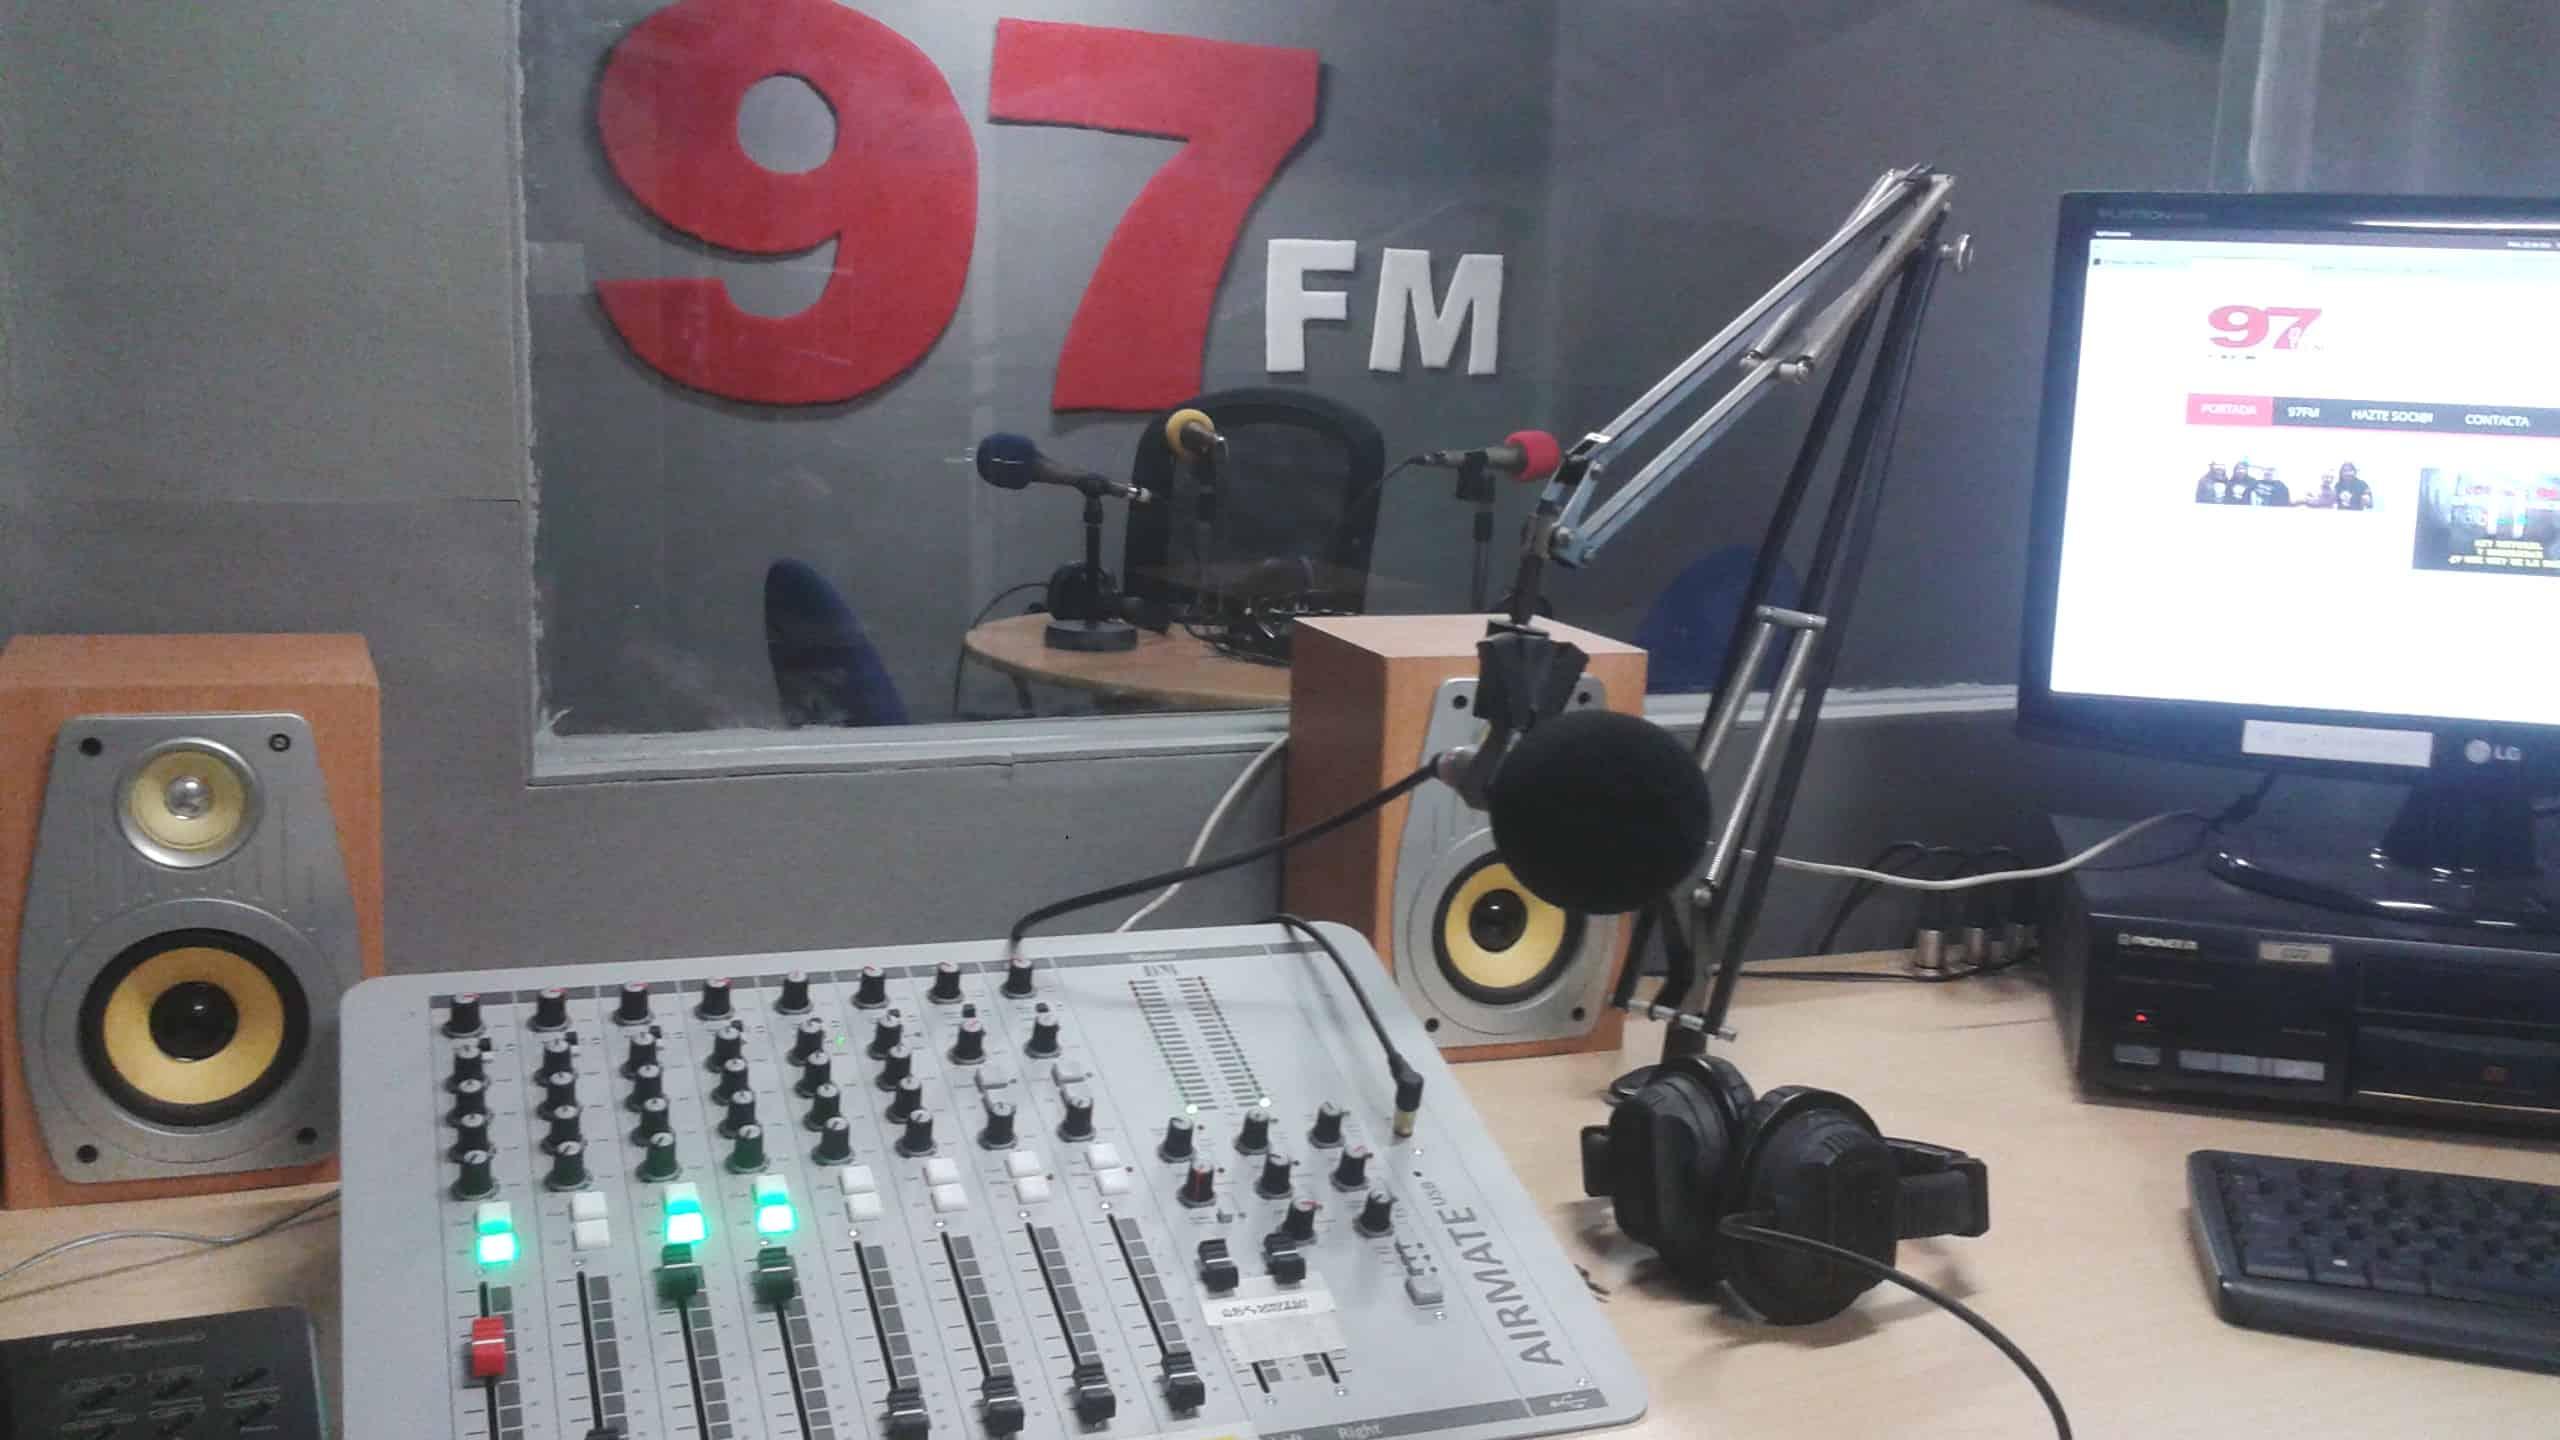 97FM irratia: 97 irratia estrena nuevo estudio de radio